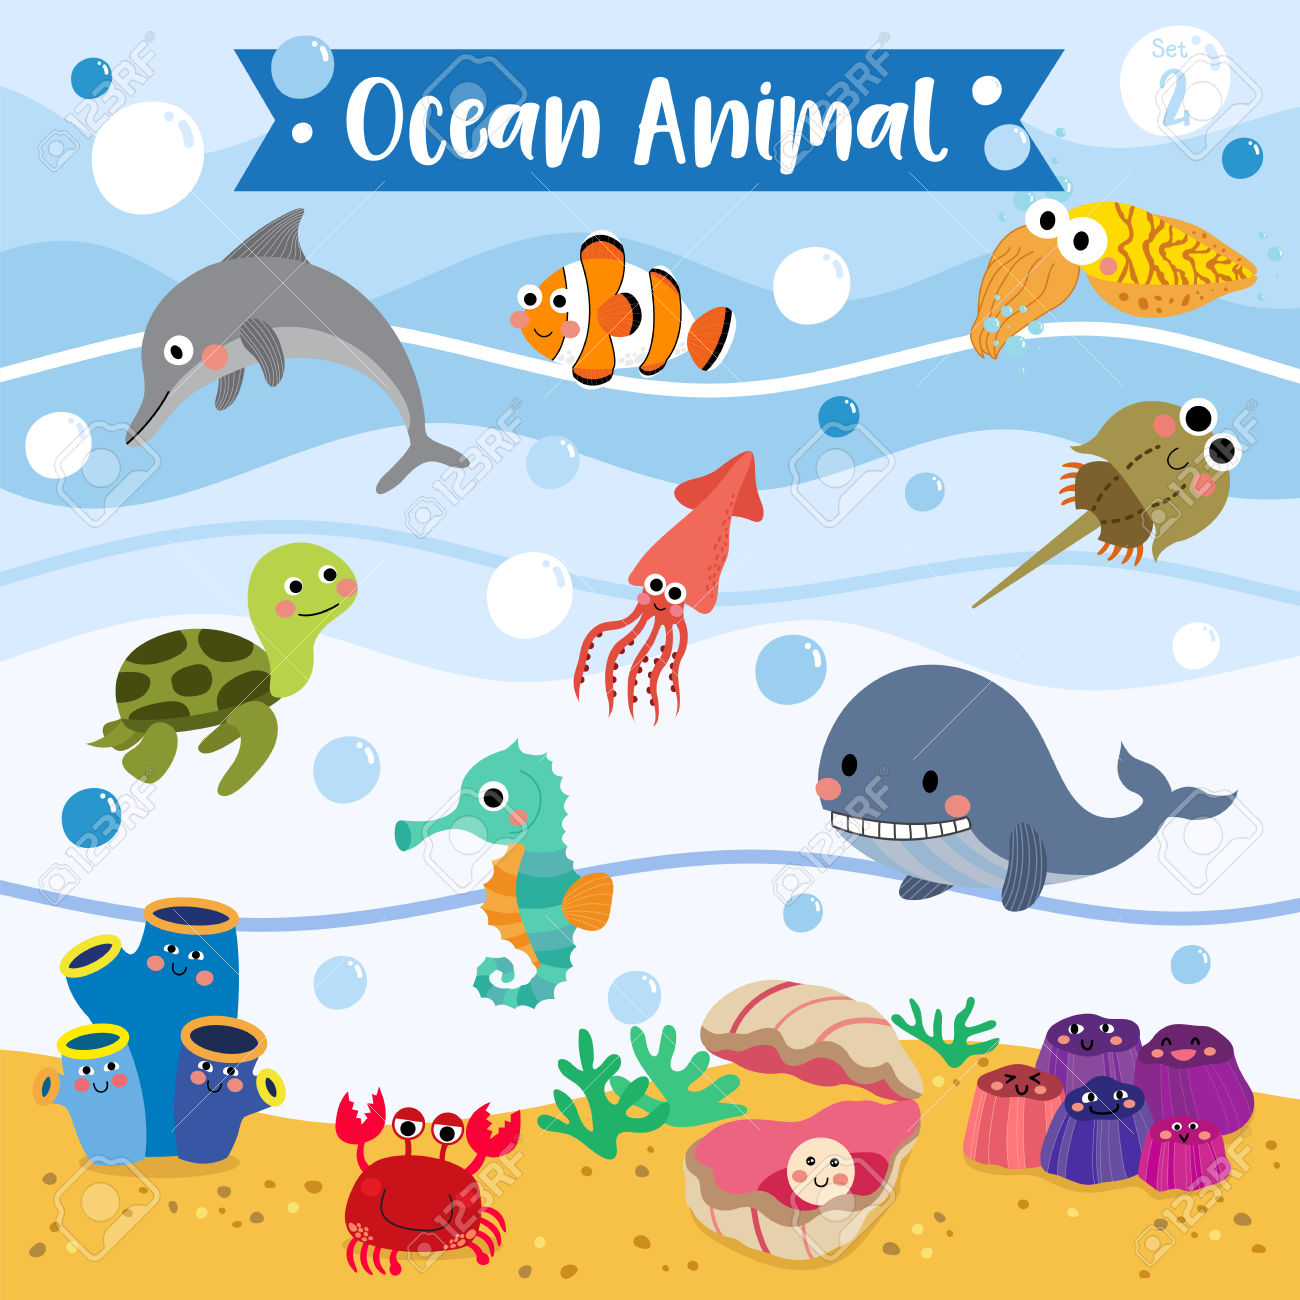 Ocean Animal Cartoon Underwater Background. Turtle. Whale. Squid.